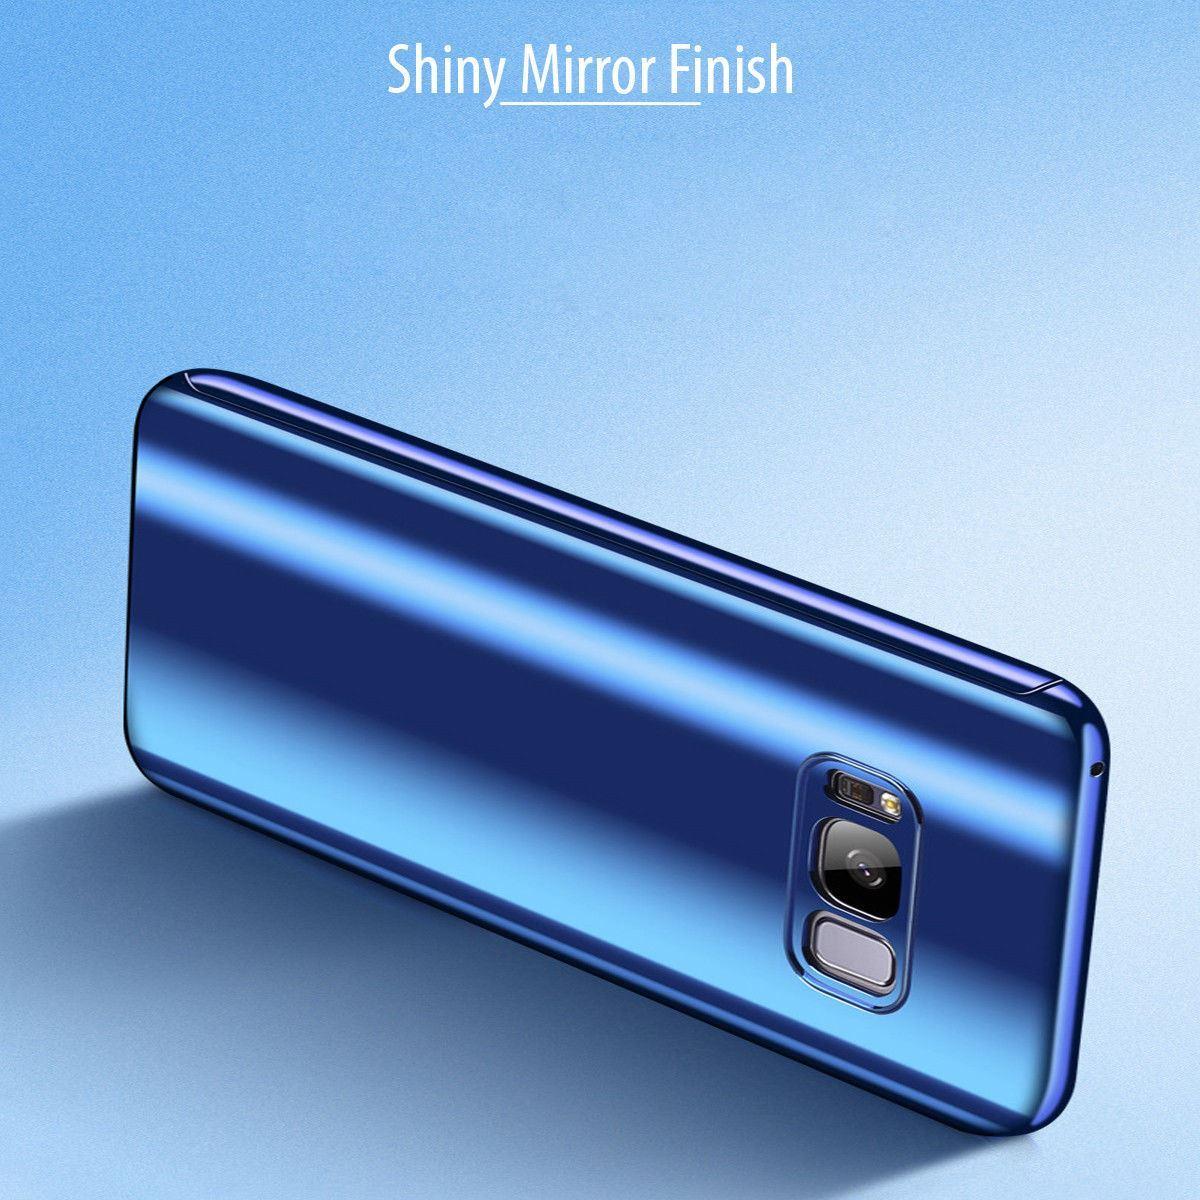 Shockproof-Hybrid-360-Ultra-Thin-Mirror-Hard-Case-Samsung-Galaxy-S7-edge-S8-S9 thumbnail 36